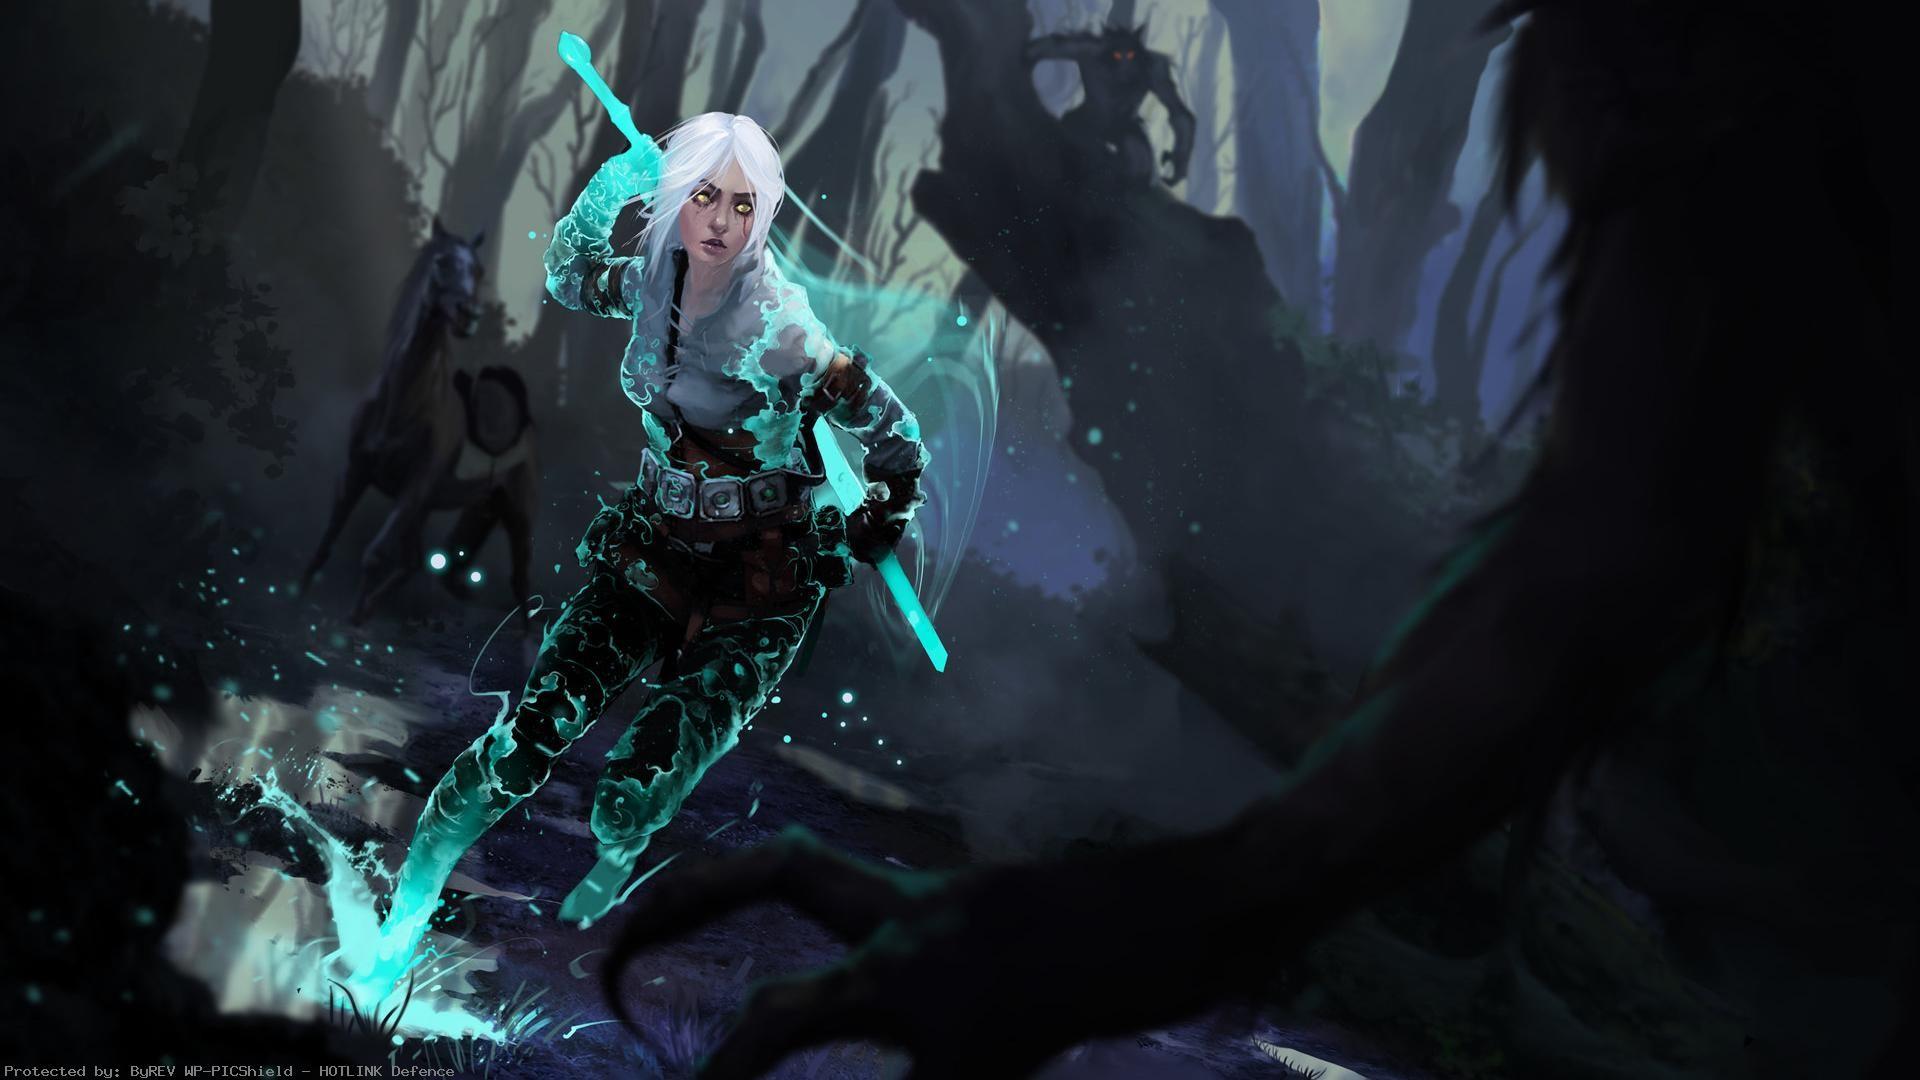 the-witcher-ciri-spell-splash-forest-1920×1080-wallpaper-